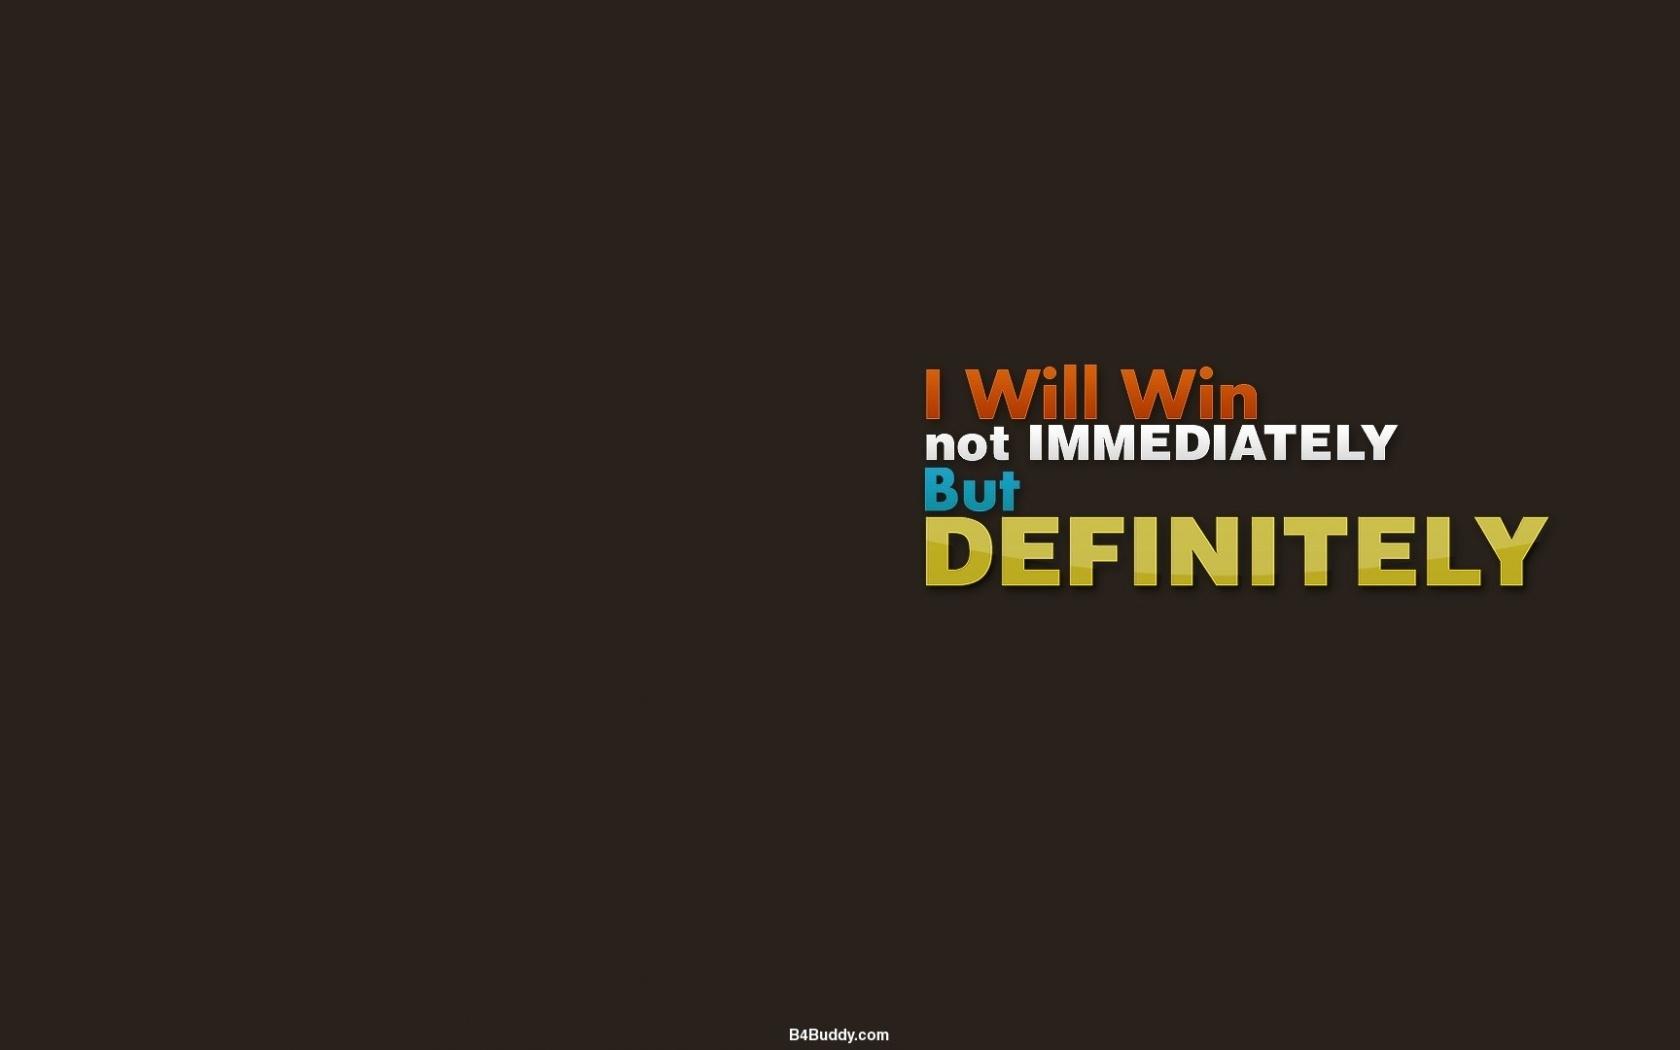 Inspirational Quotes Wallpaper For Desktop QuotesGram 1680x1050